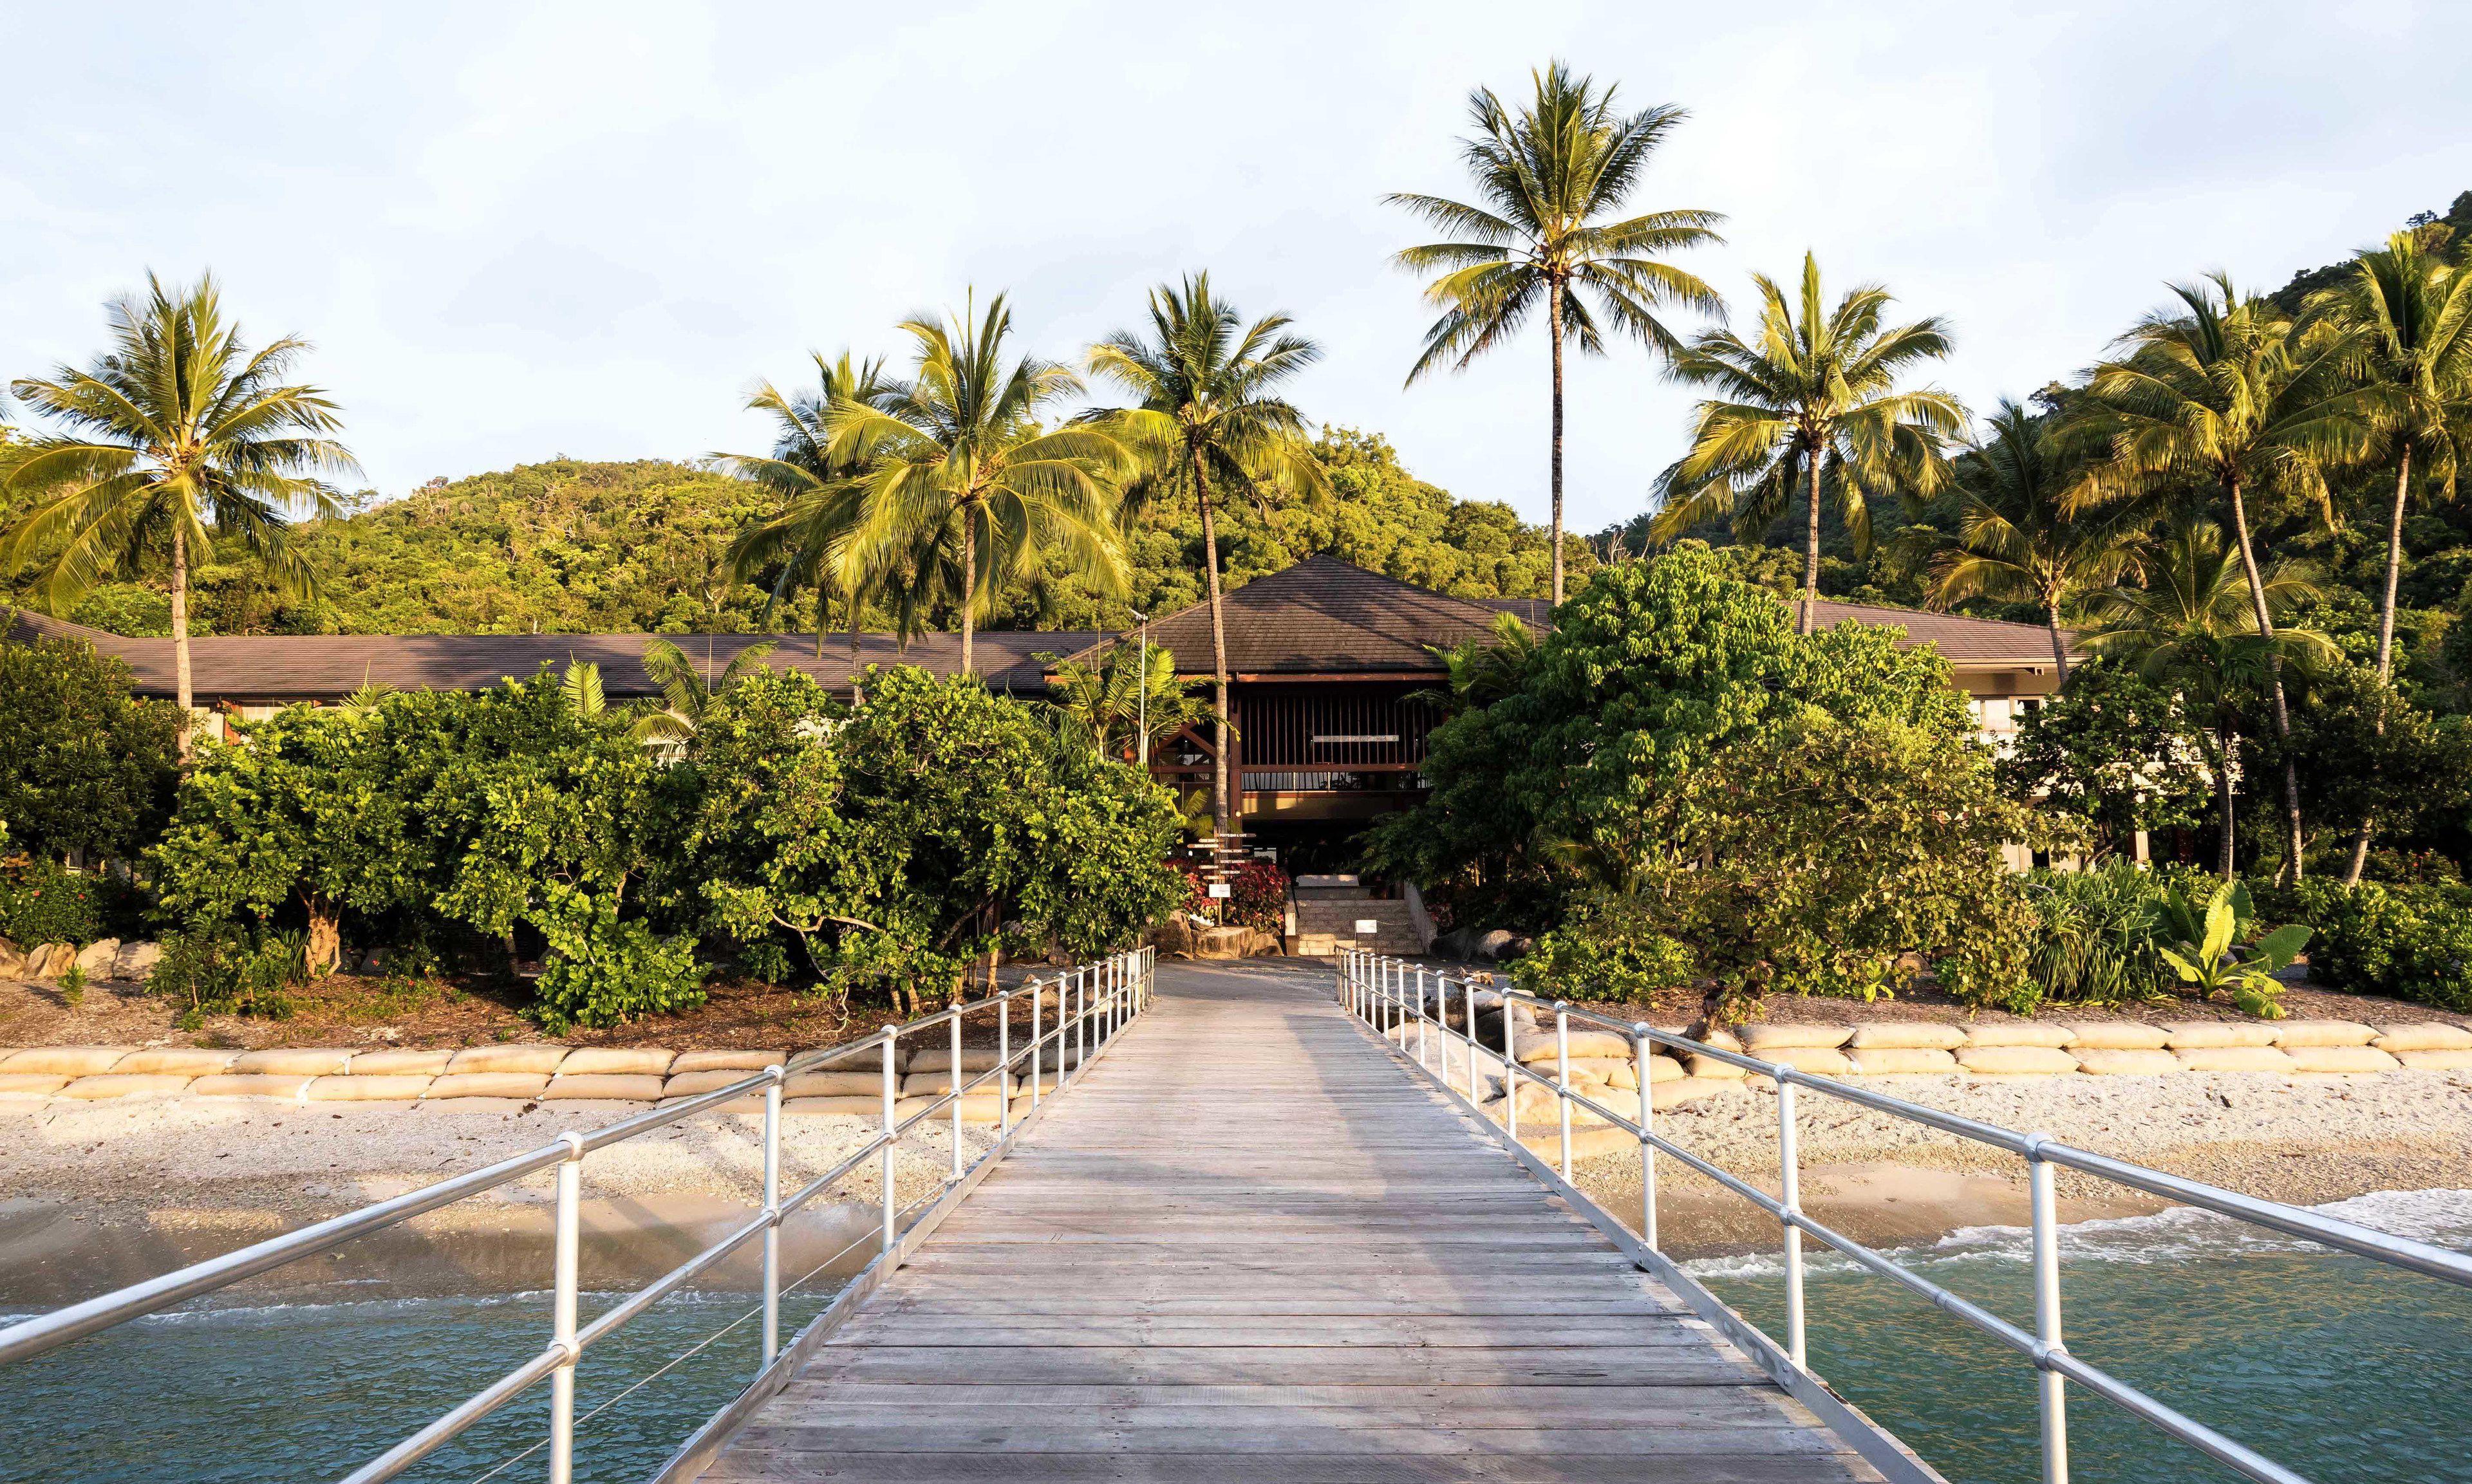 Courtesy of Fitzroy Island Resort / Expedia